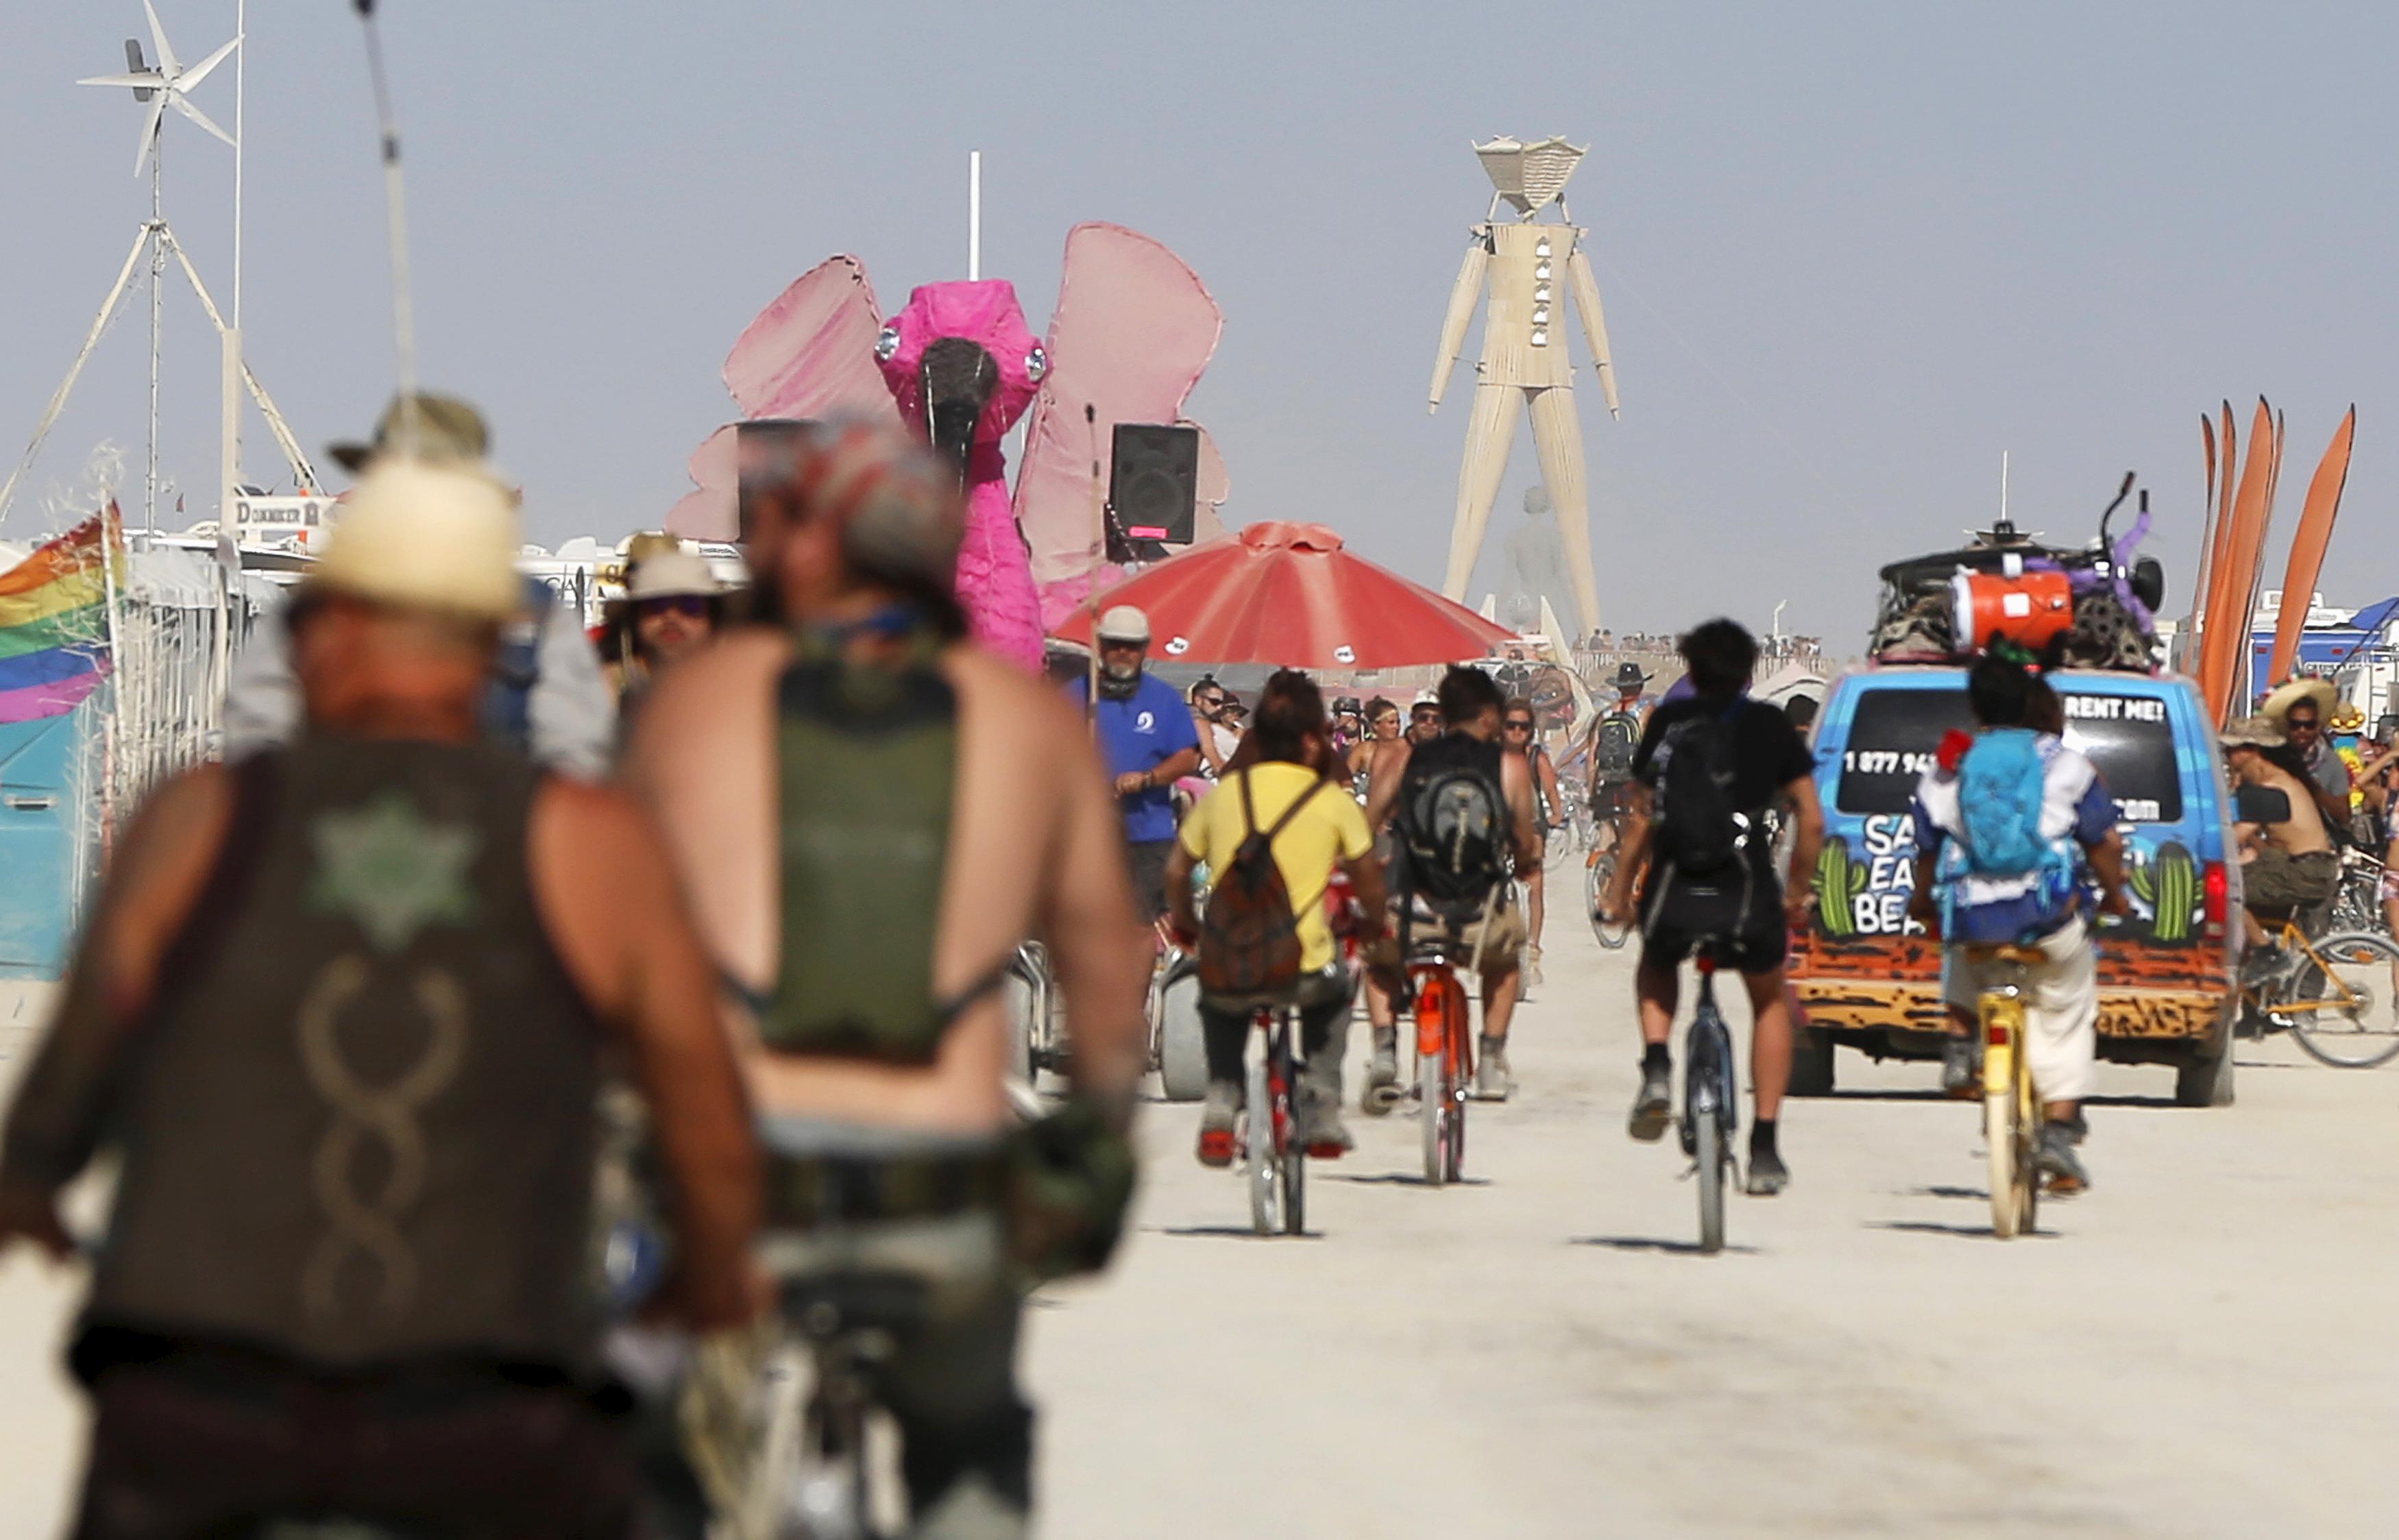 Photos Biking Do S And Don Ts At The Burning Man Festival Pbs